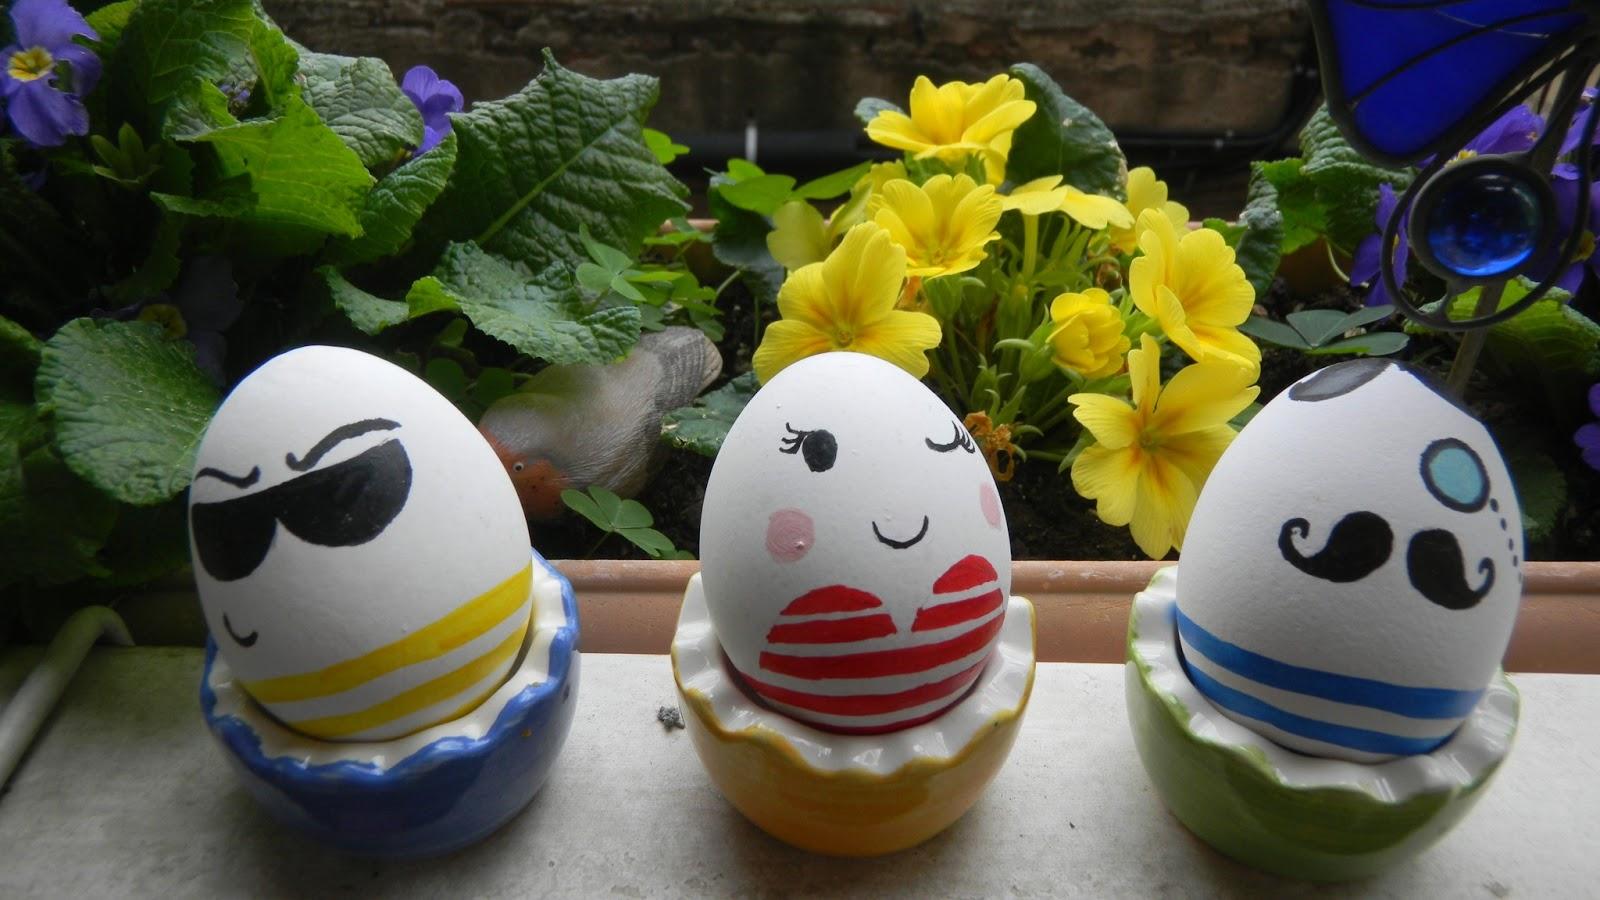 Huevos de pascua decorados vol 3 21 fotos imagenes y - Huevos decorados de pascua ...